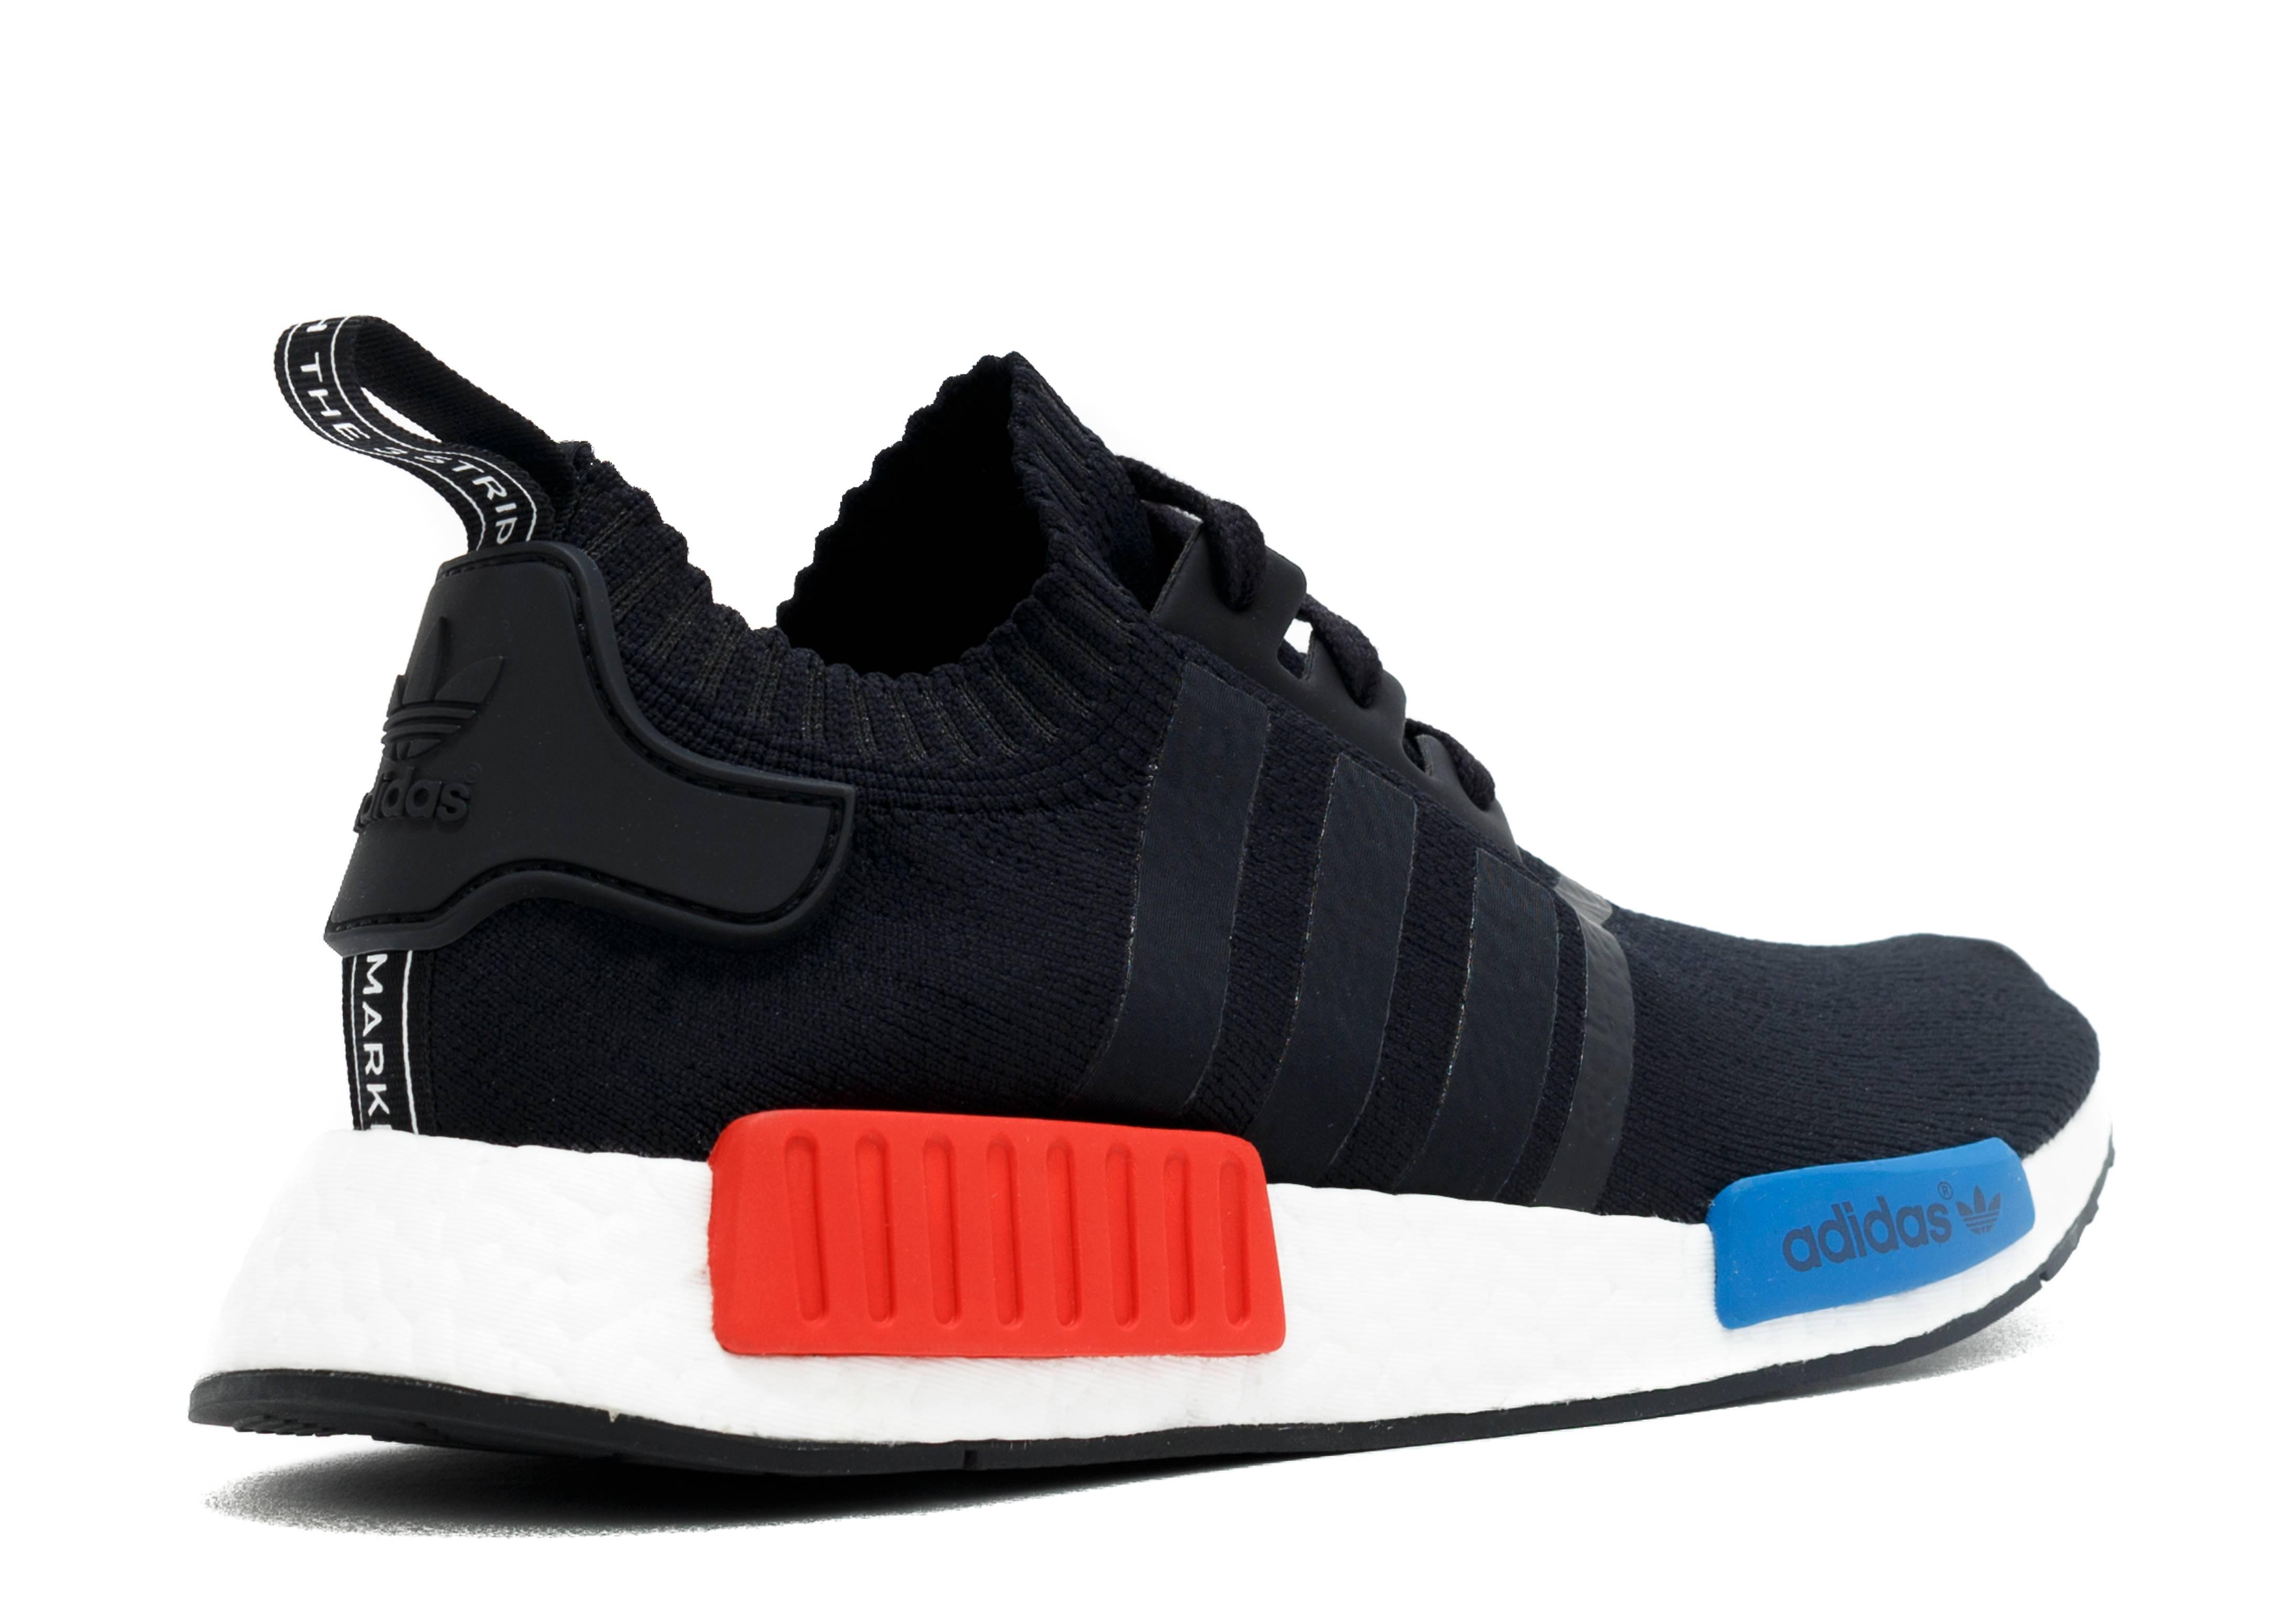 Nmd Runner Pk Adidas s79168a blackwhite rd blu